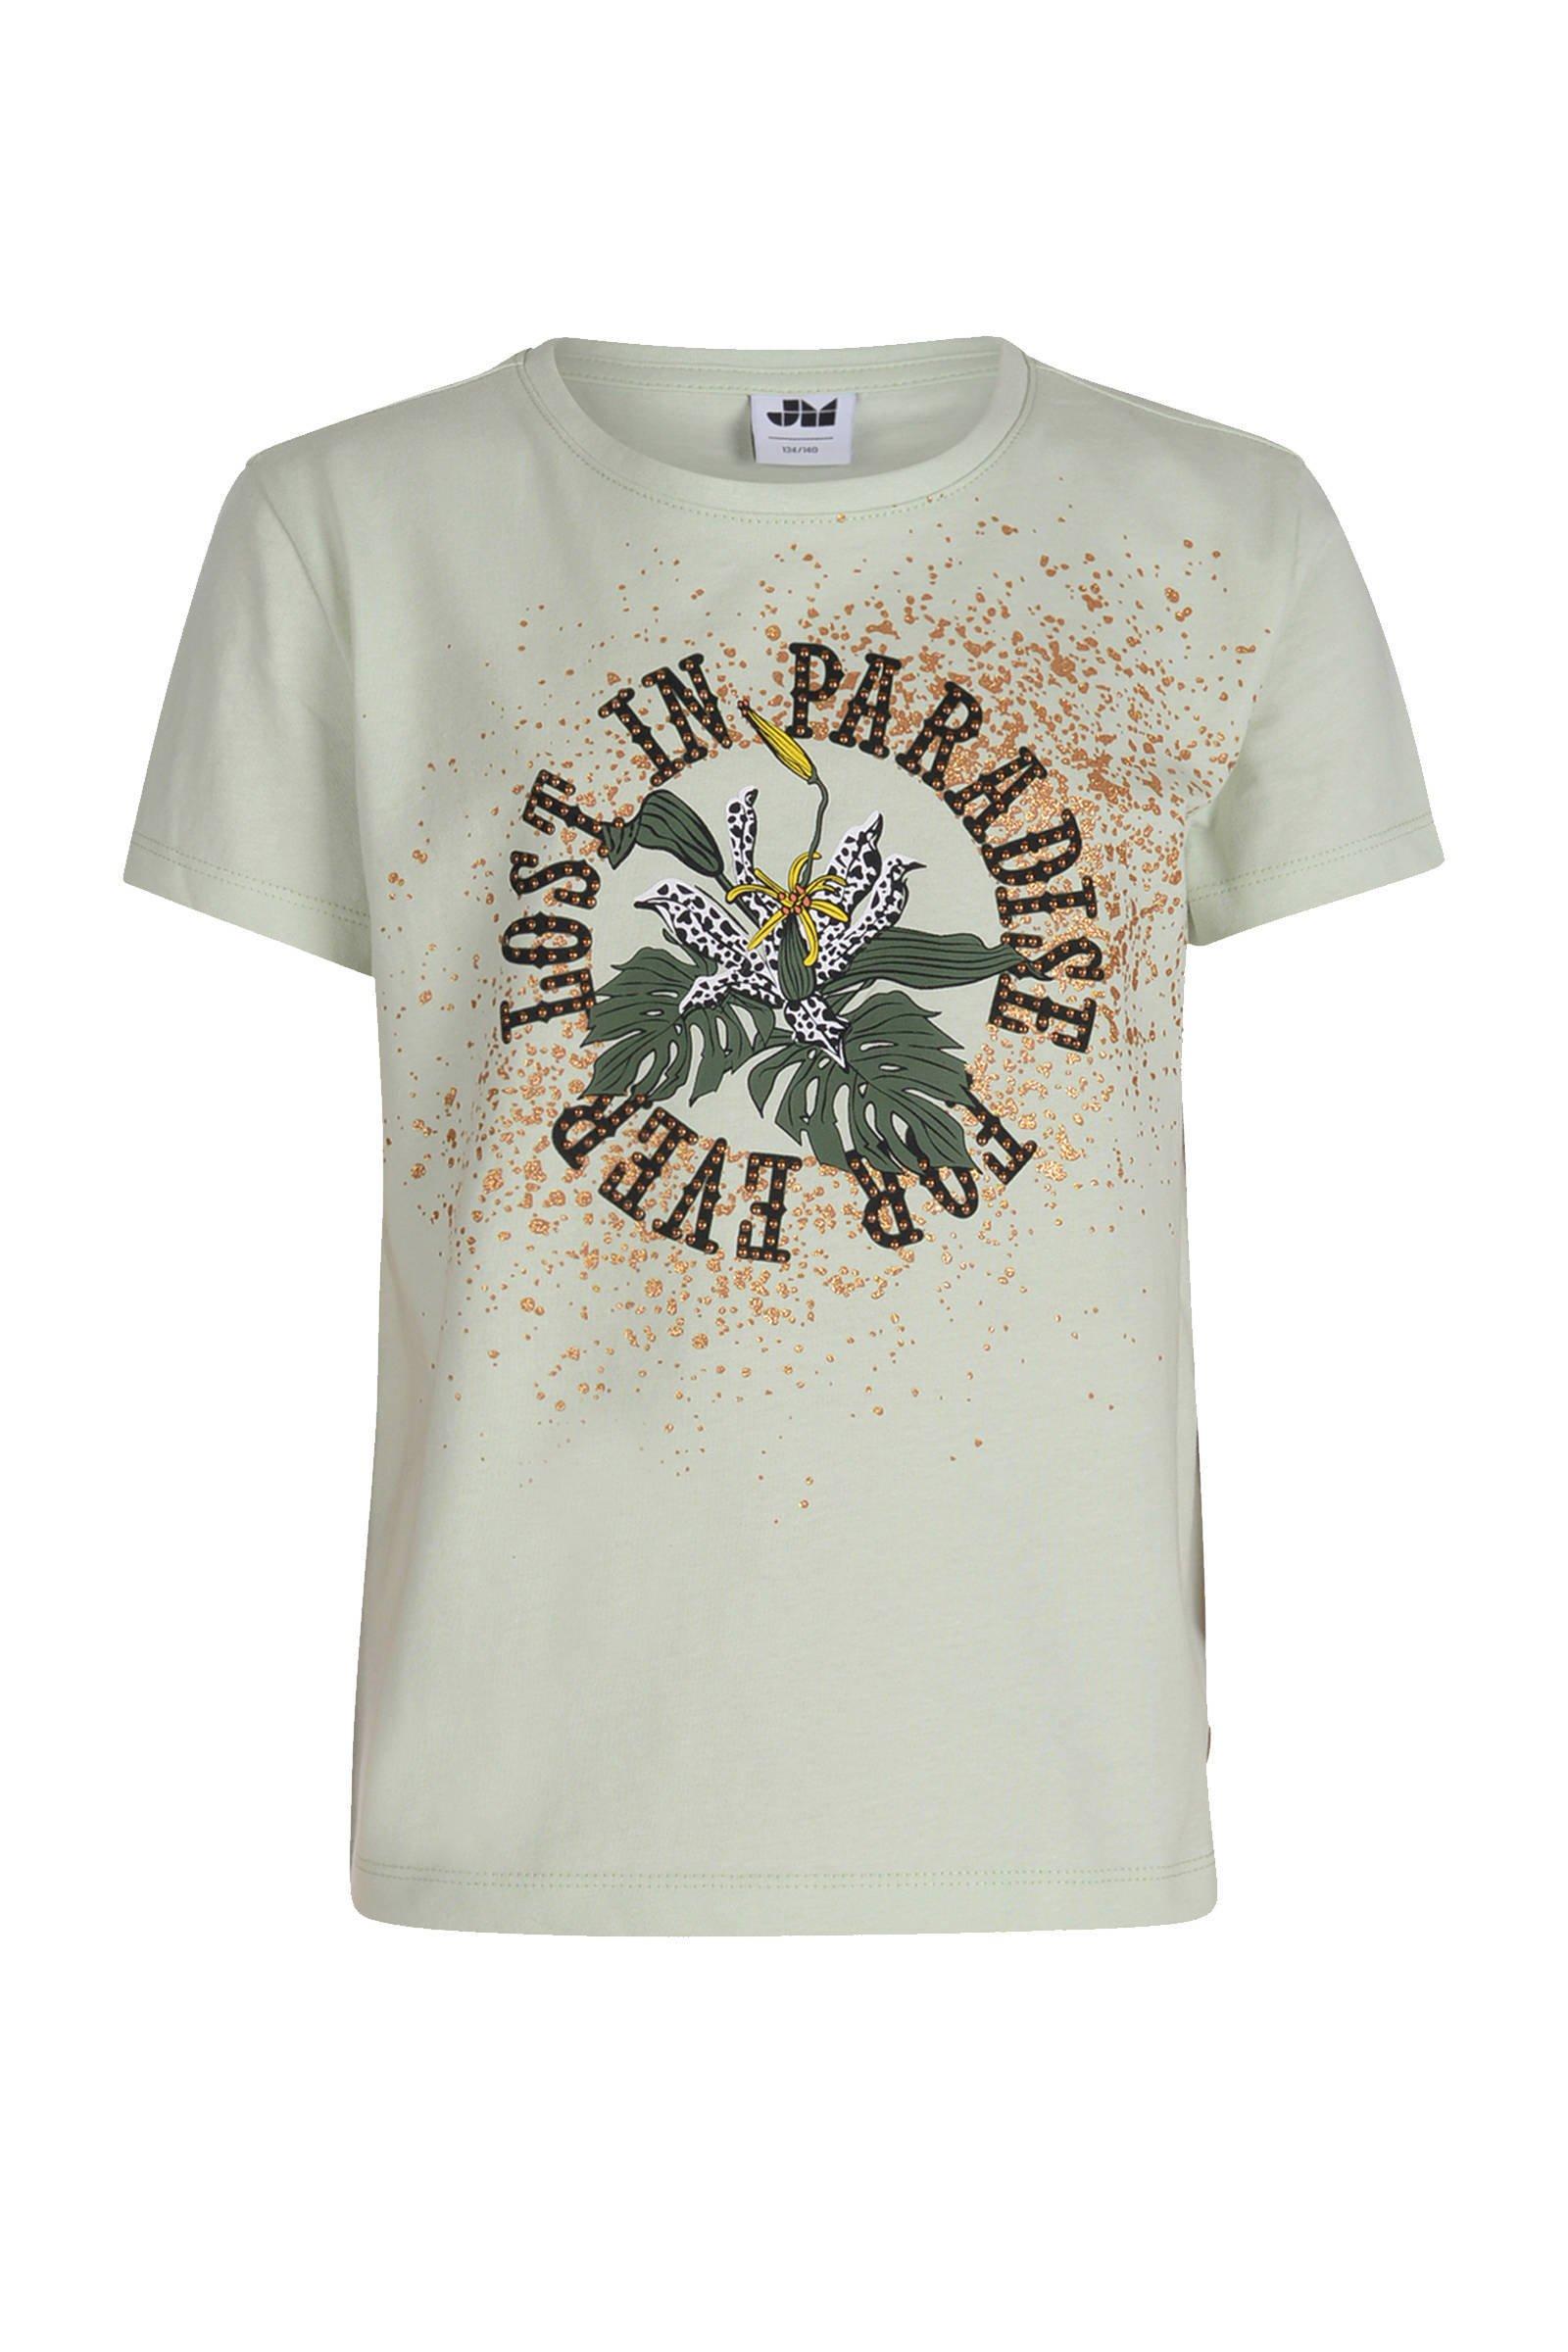 Jill & Mitch by Shoeby T-shirt Harmony met printopdruk lichtgroen/oranje - maat 158/164